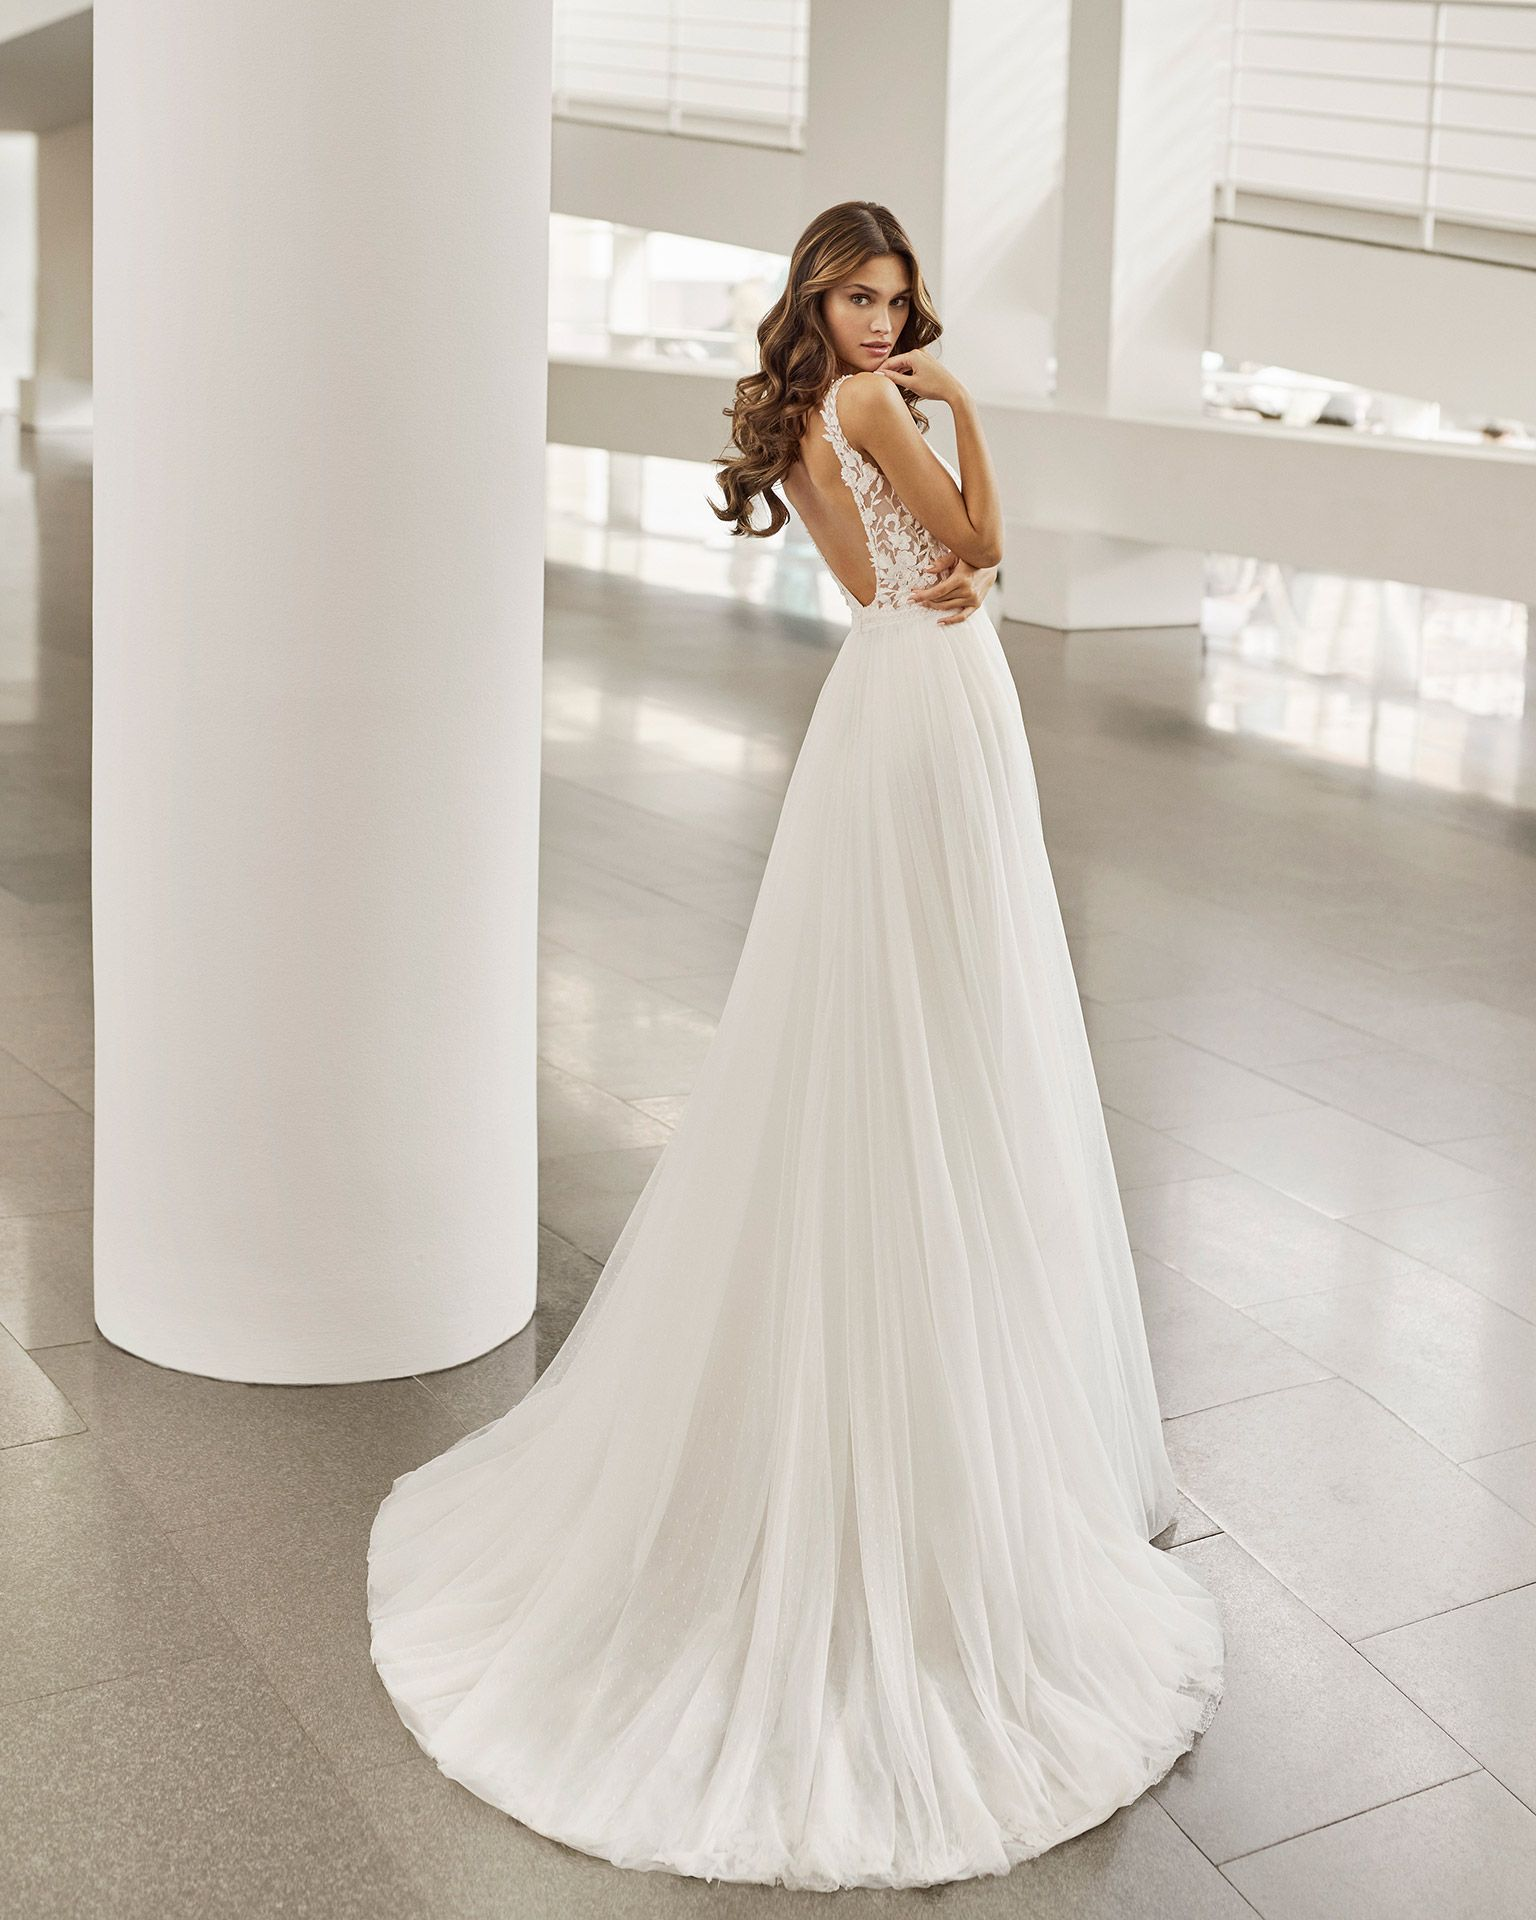 Rosa Clara 2022 - Nesire - Hannah Elizabeth Bridal Boutique Hampshire